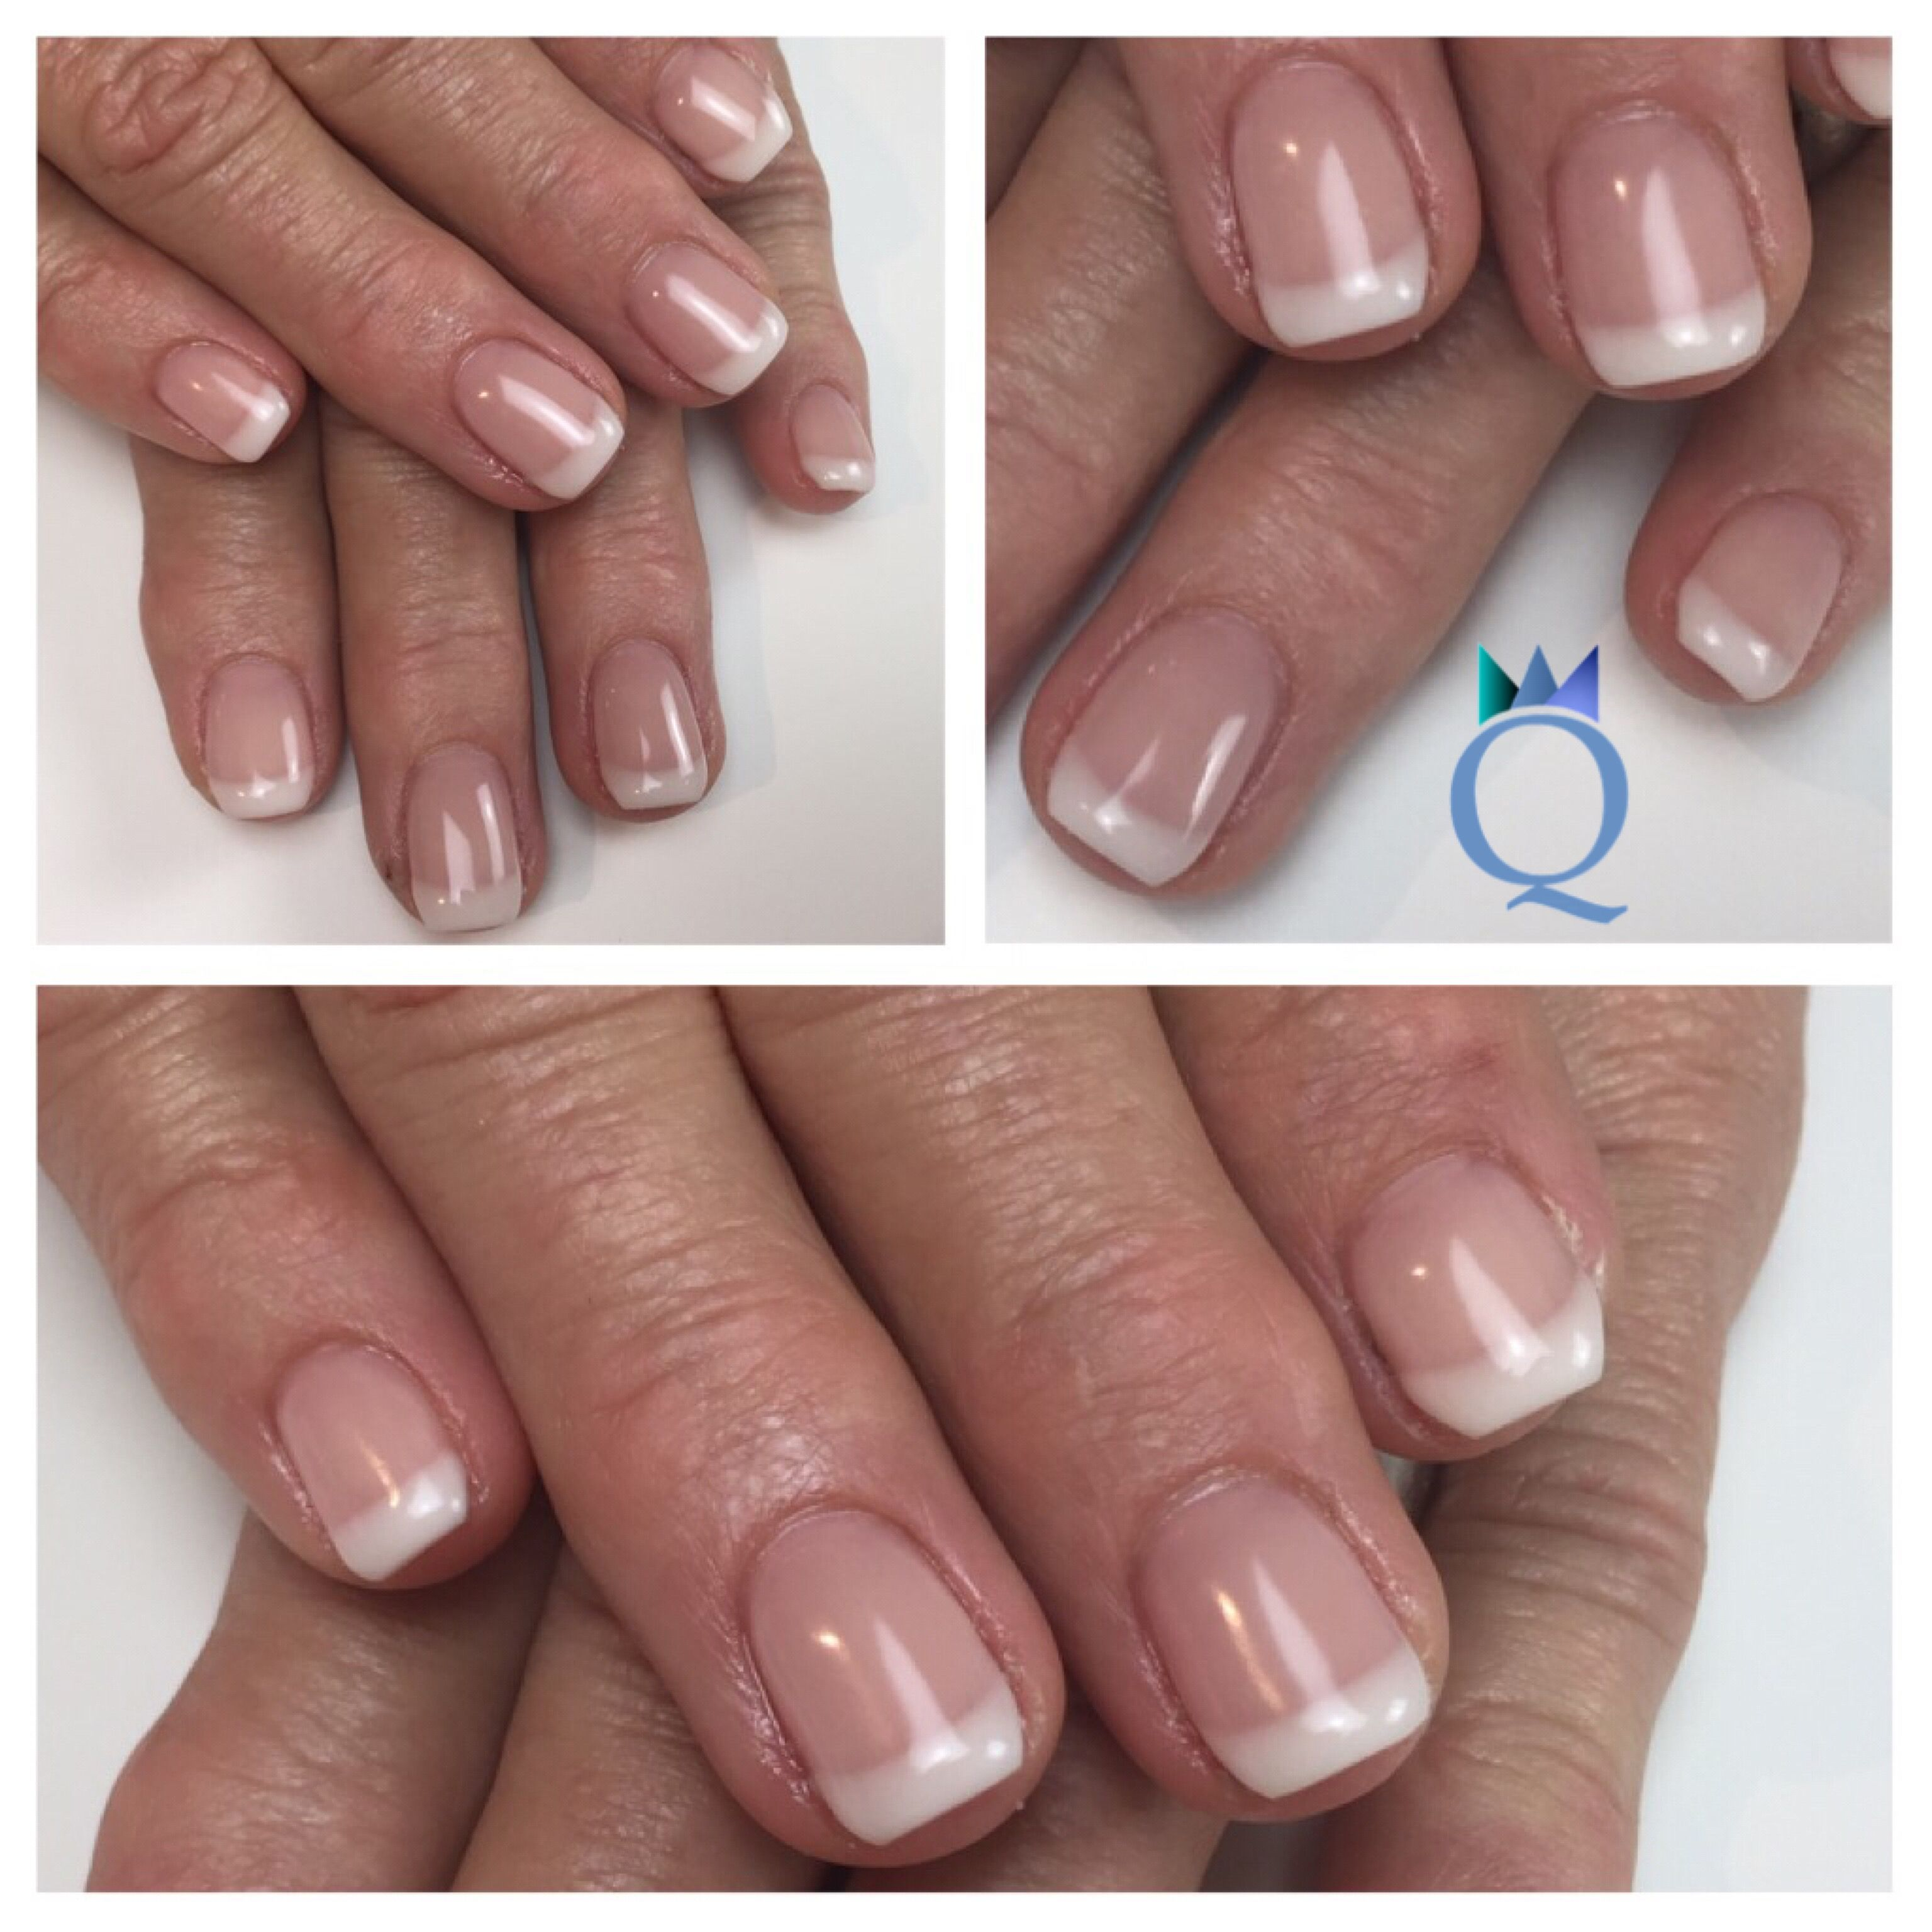 French Nails NatüRlich AP49 | Messianica